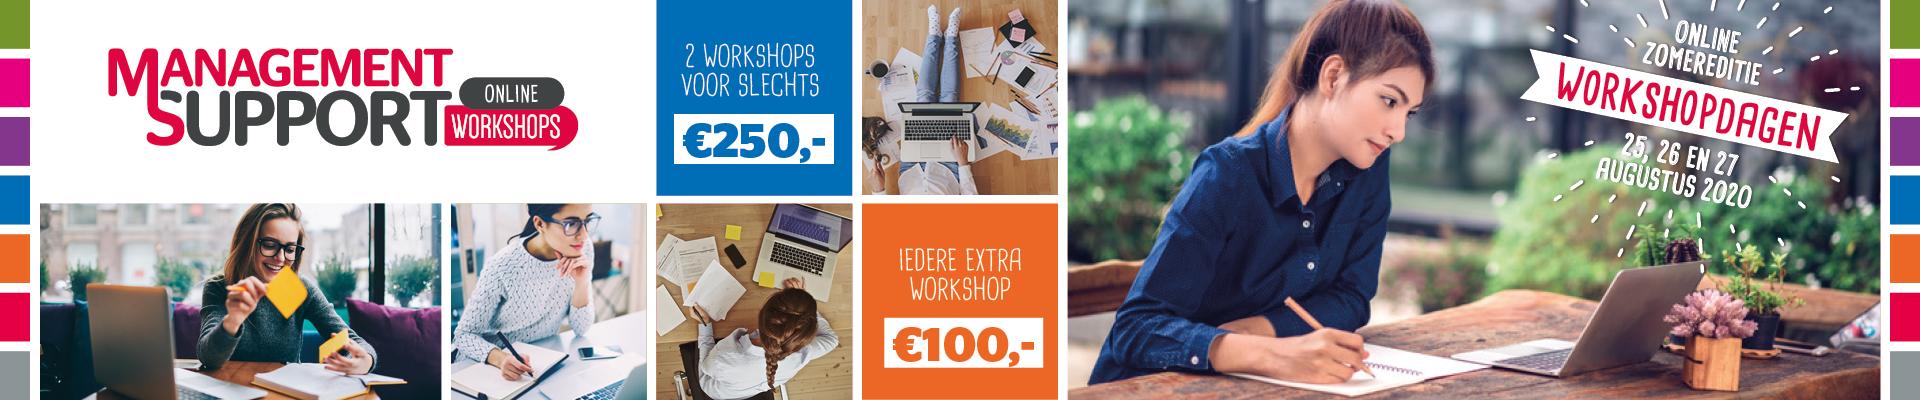 Workshopdagen Management Support 2020